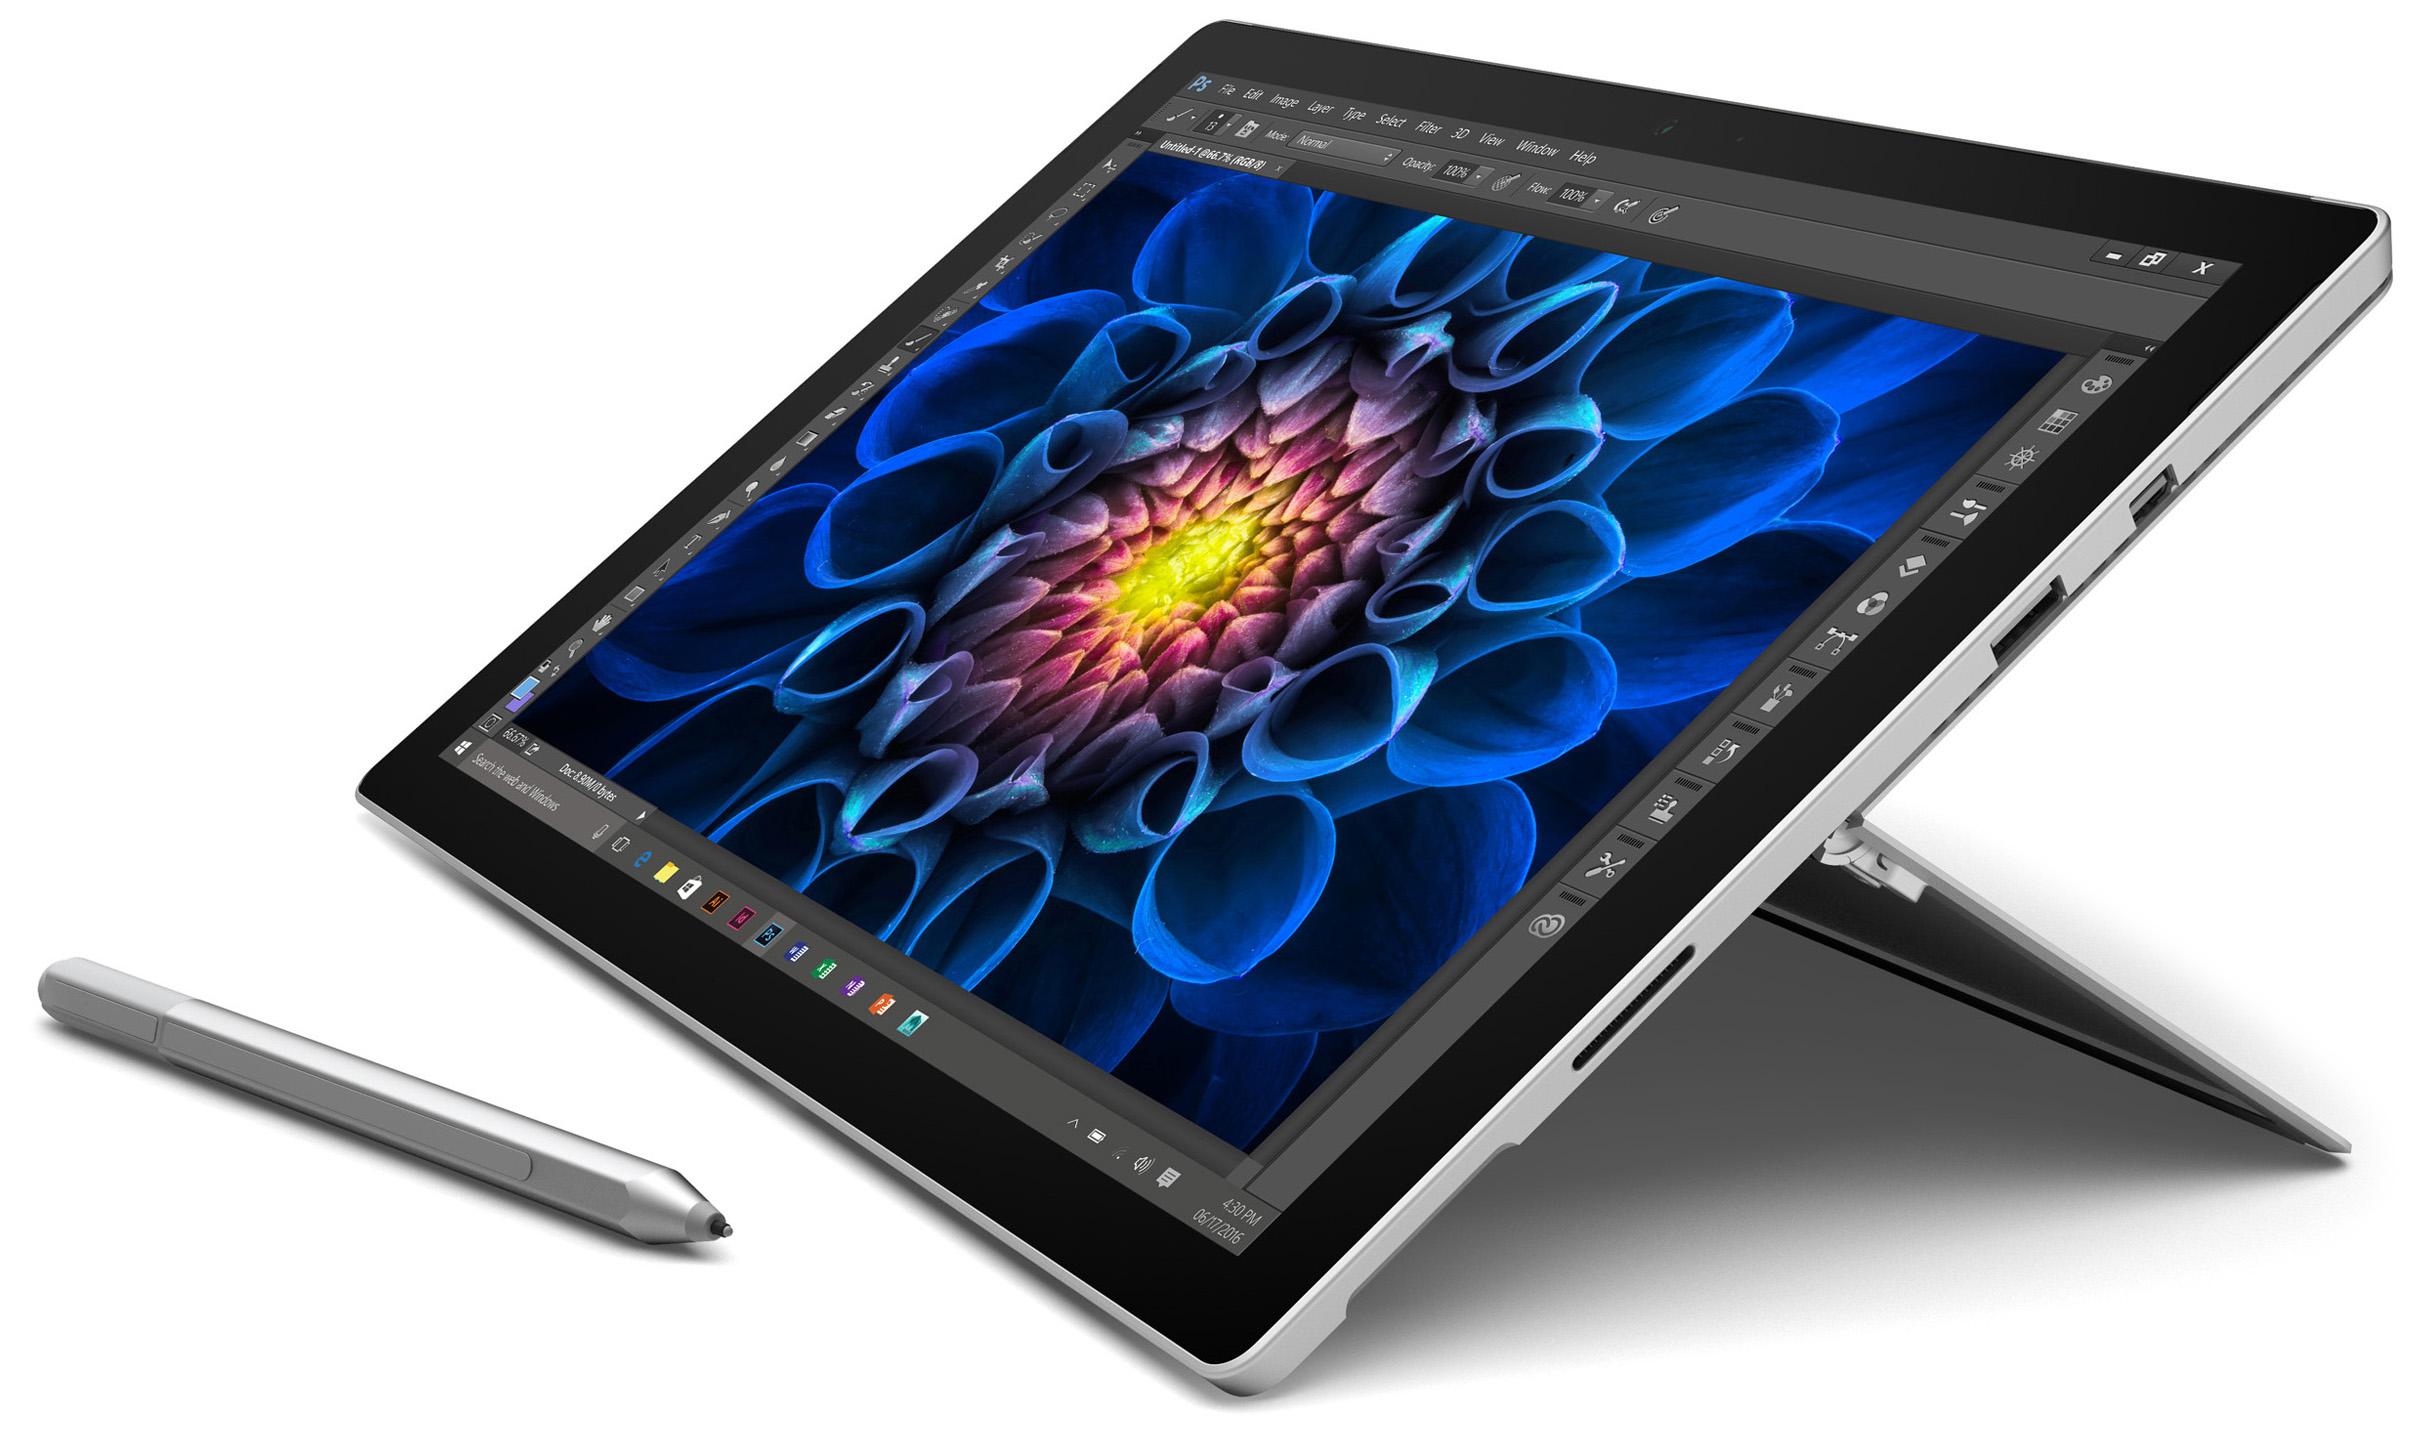 Microsoft Surface Pro 4 - i7 1TB / 16GB RAM